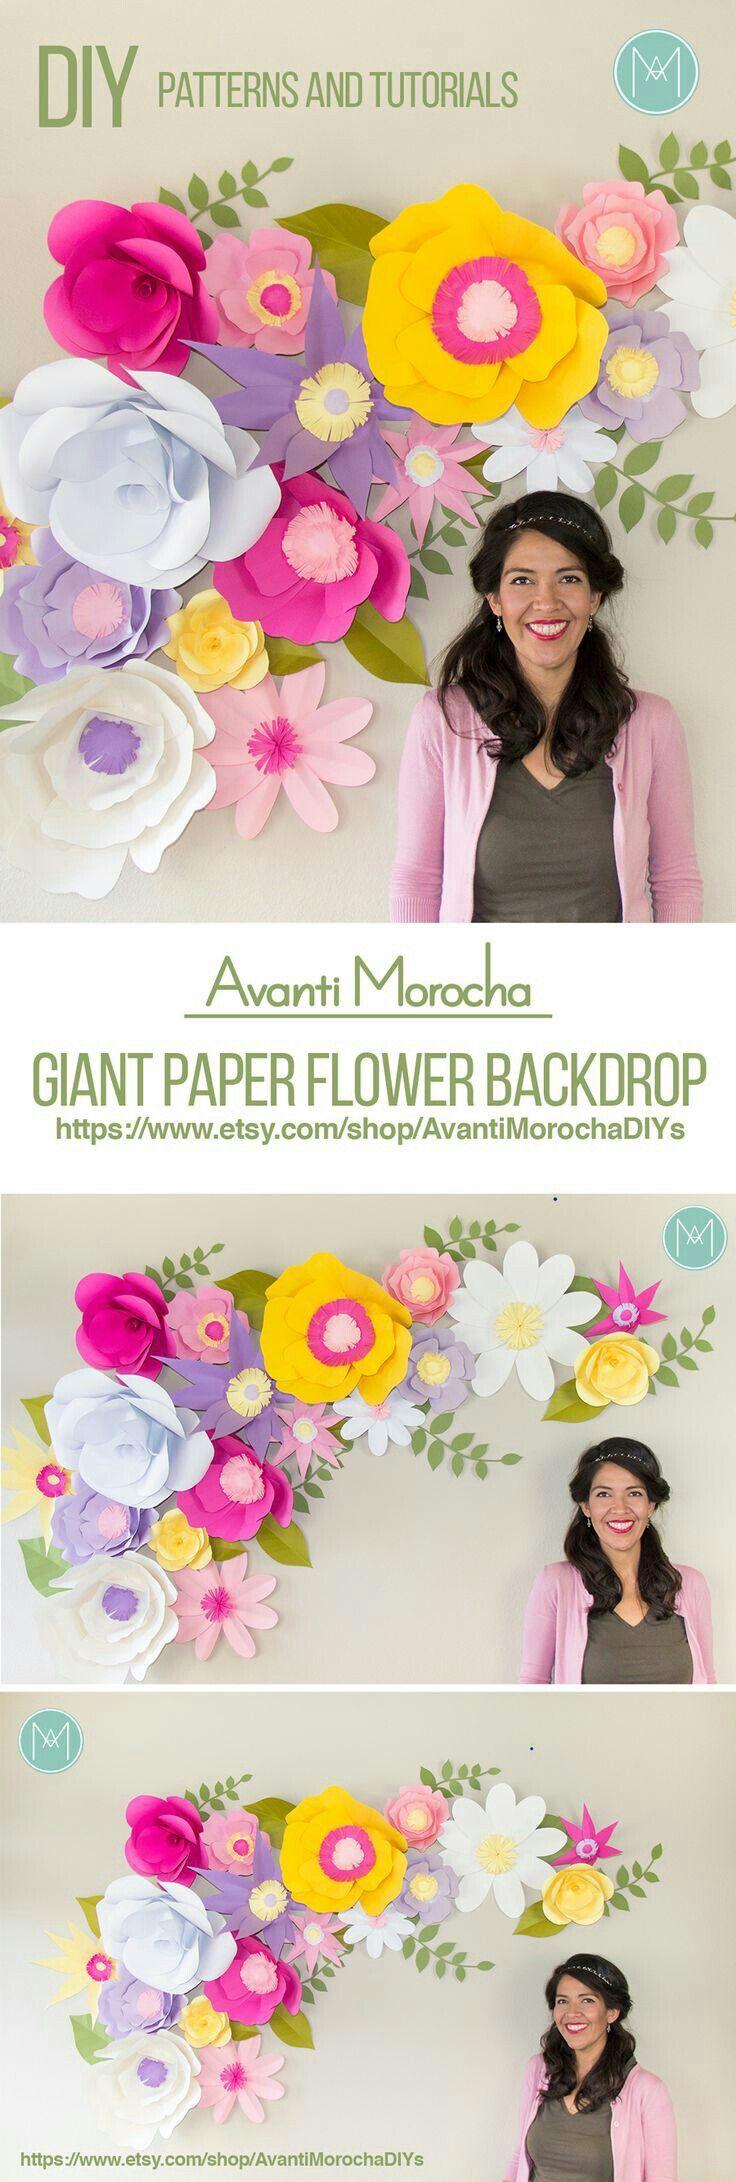 Diy Giant Paper Flower Backdrop Tutorial Moana Pinterest